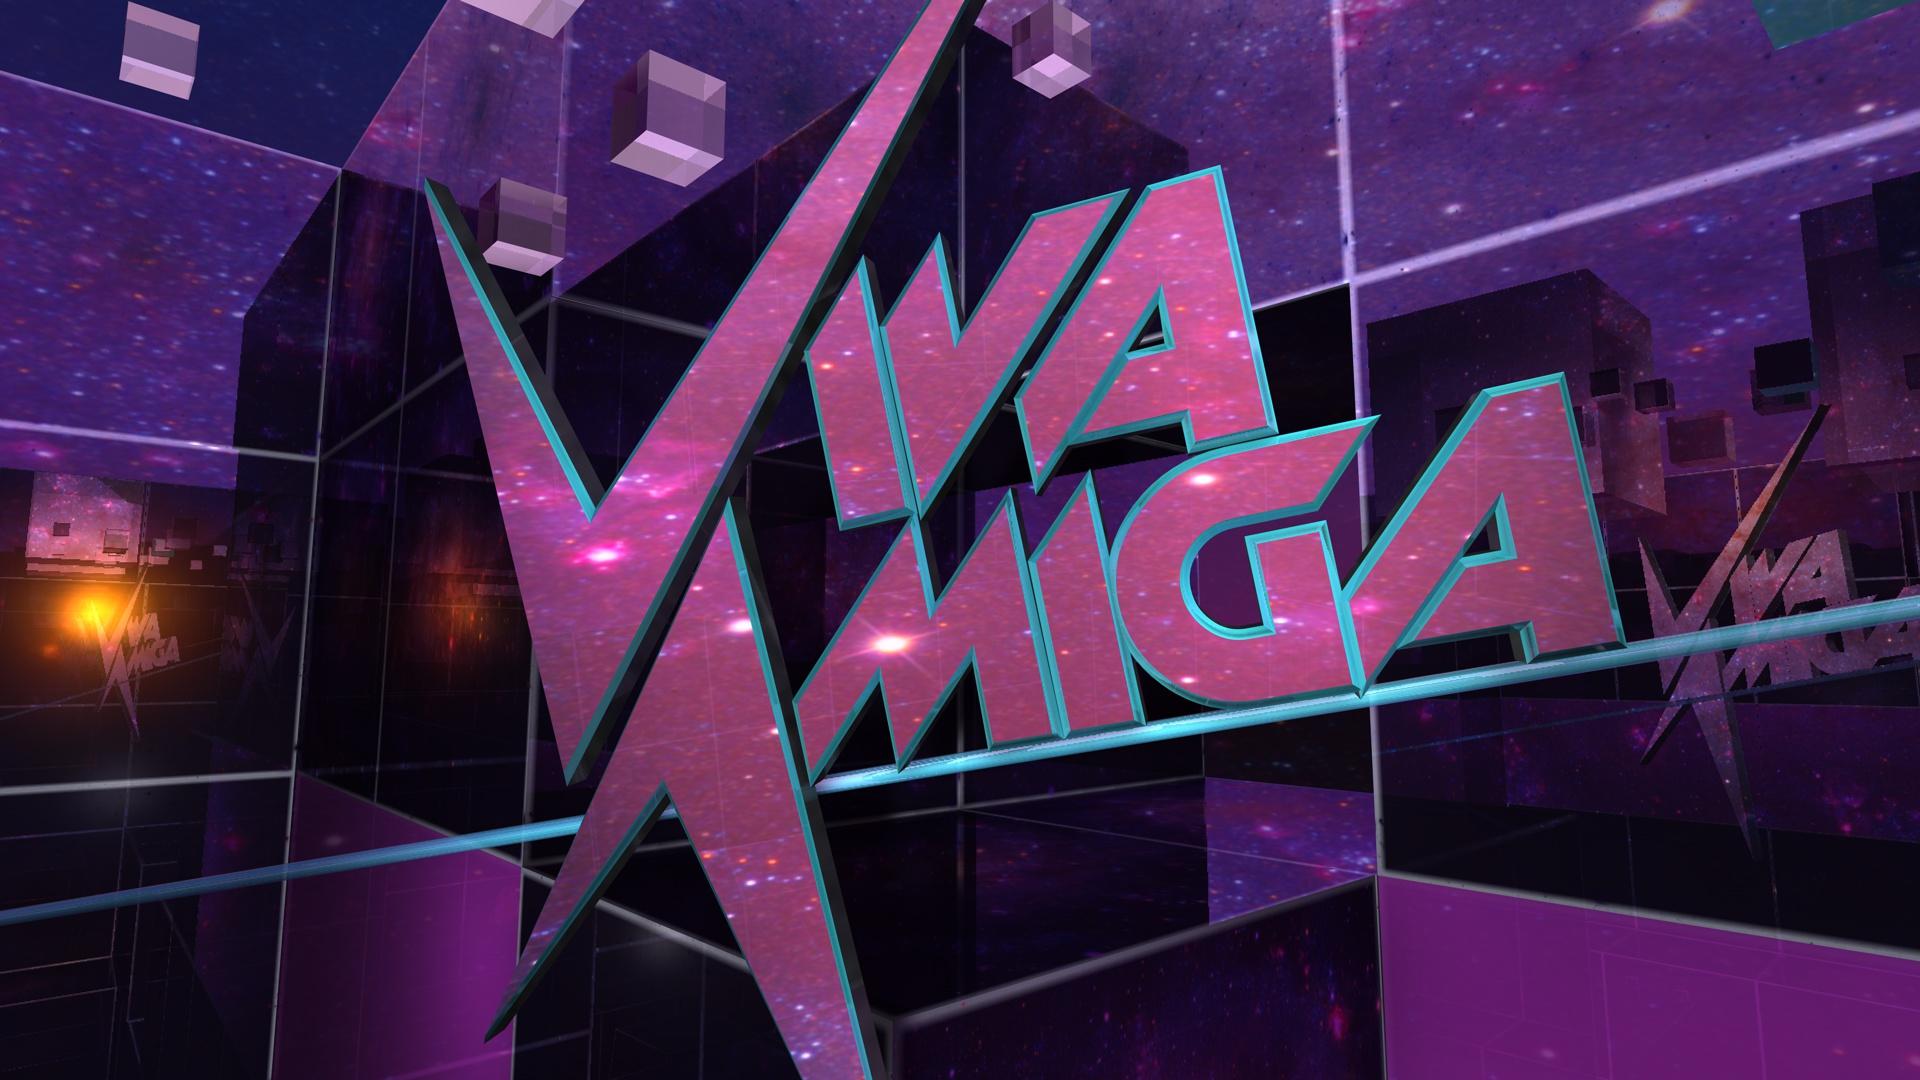 Viva Amiga - Original soundtrack work for Zach Weddington's successfully kickstarted documentary on the history and culture of the Amiga computer. 2016